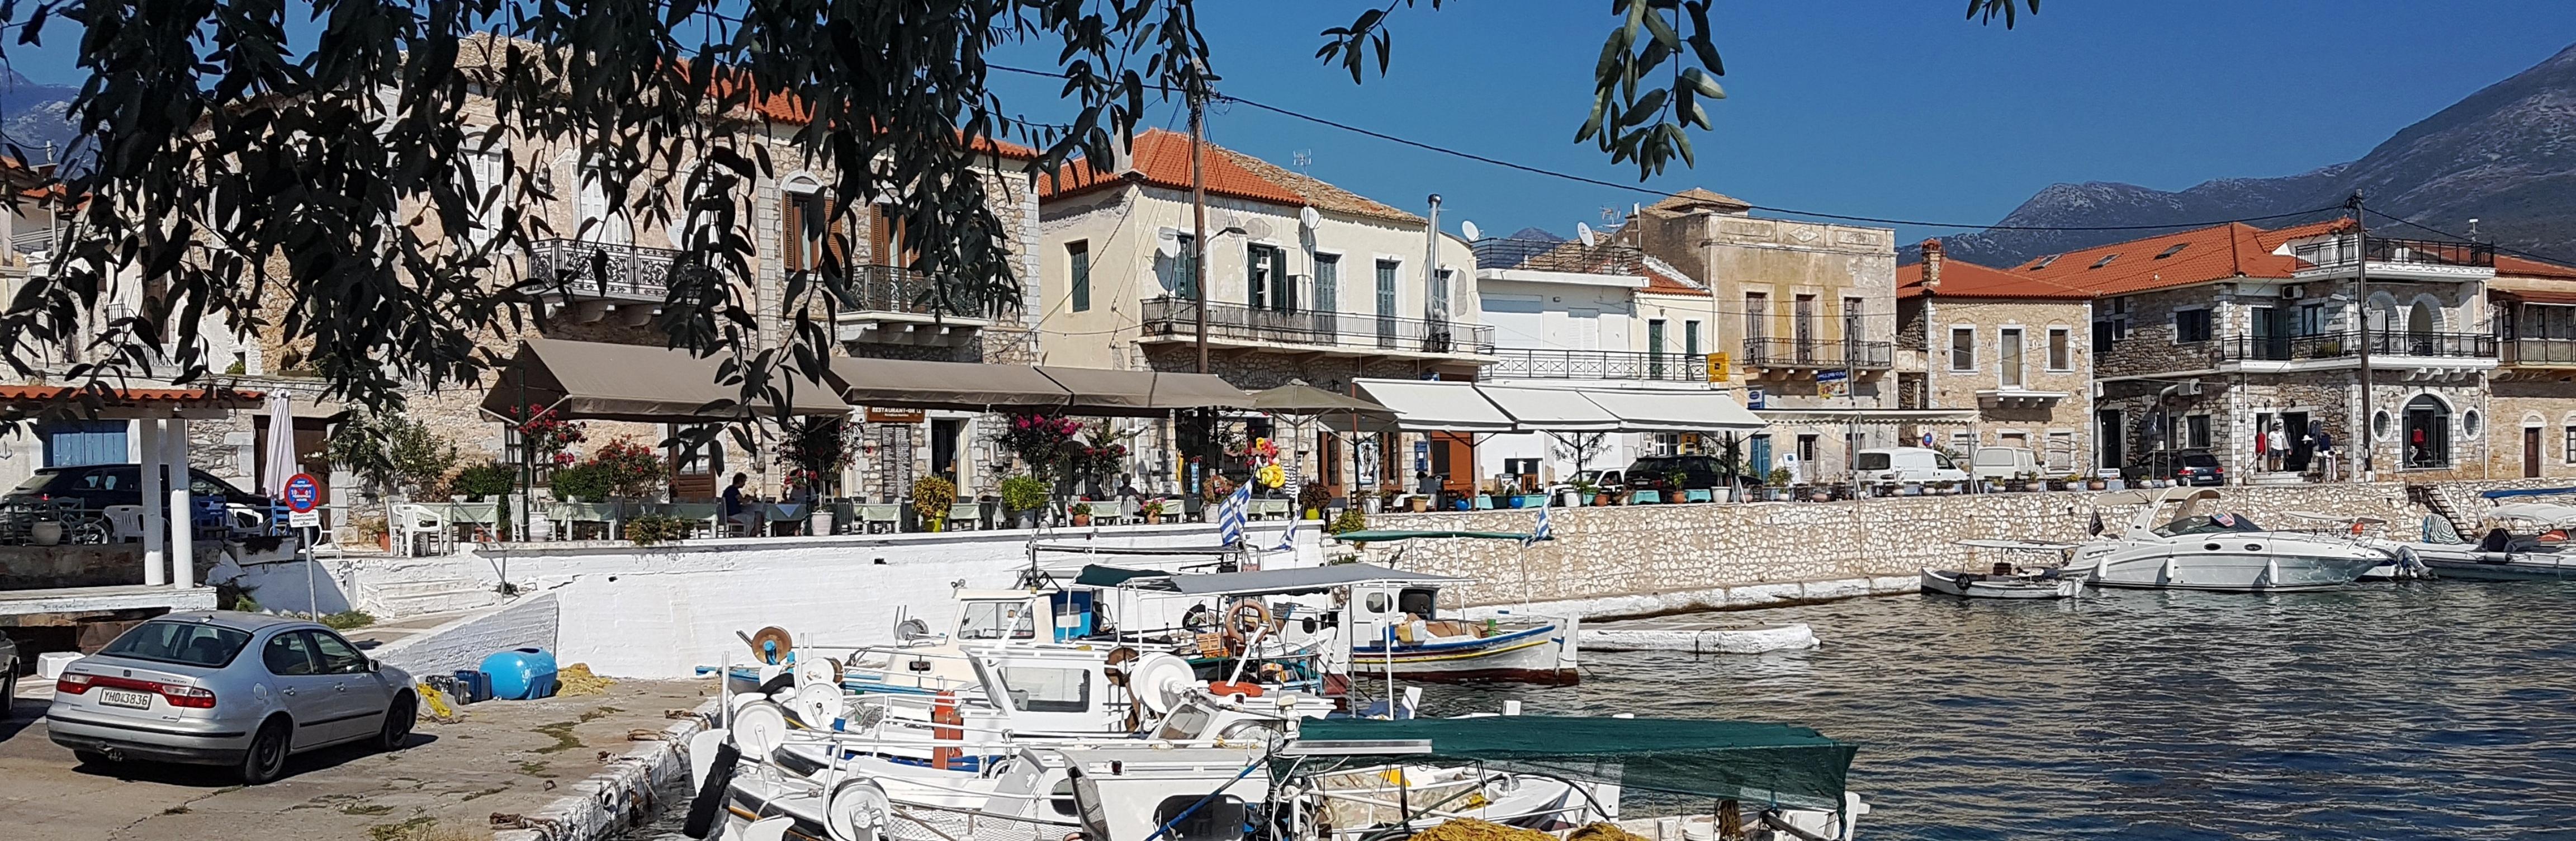 Banner_Peloponnesos-Agios_Nikolaos_03